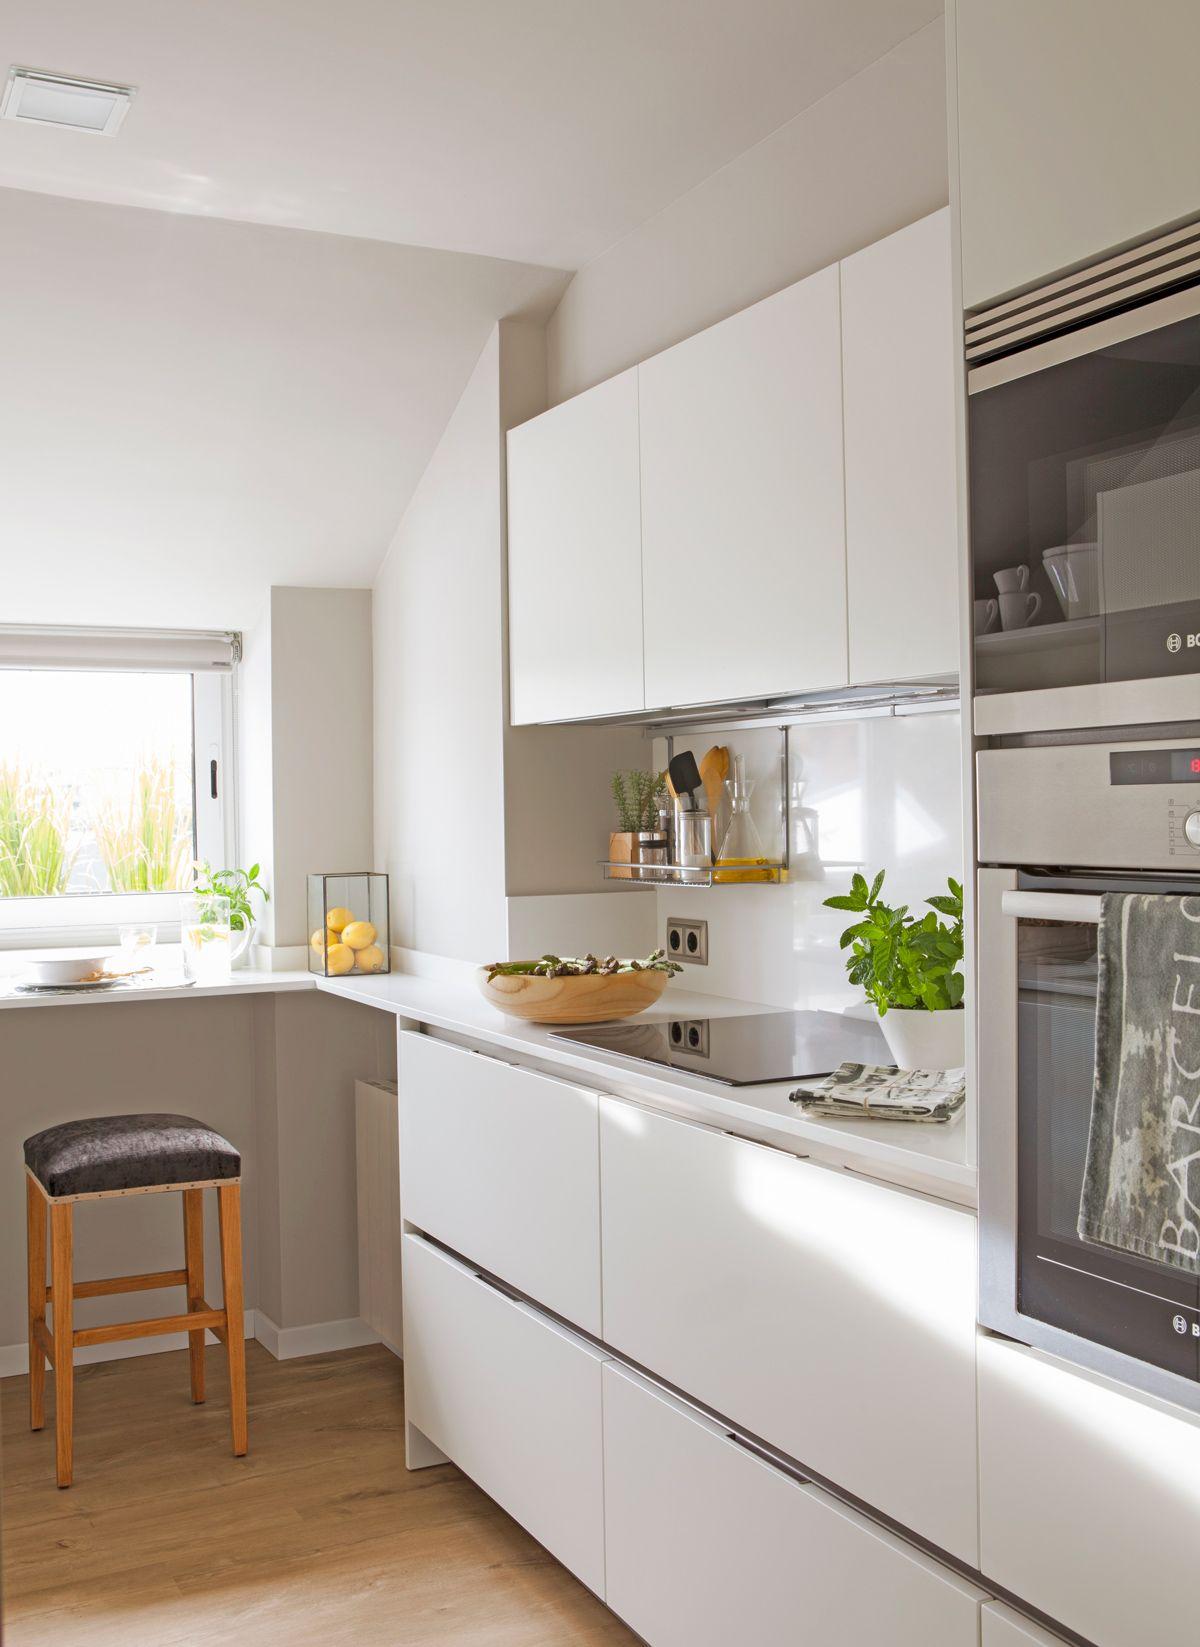 Solo un frente de armarios residential en 2019 - Cocinas blancas ...